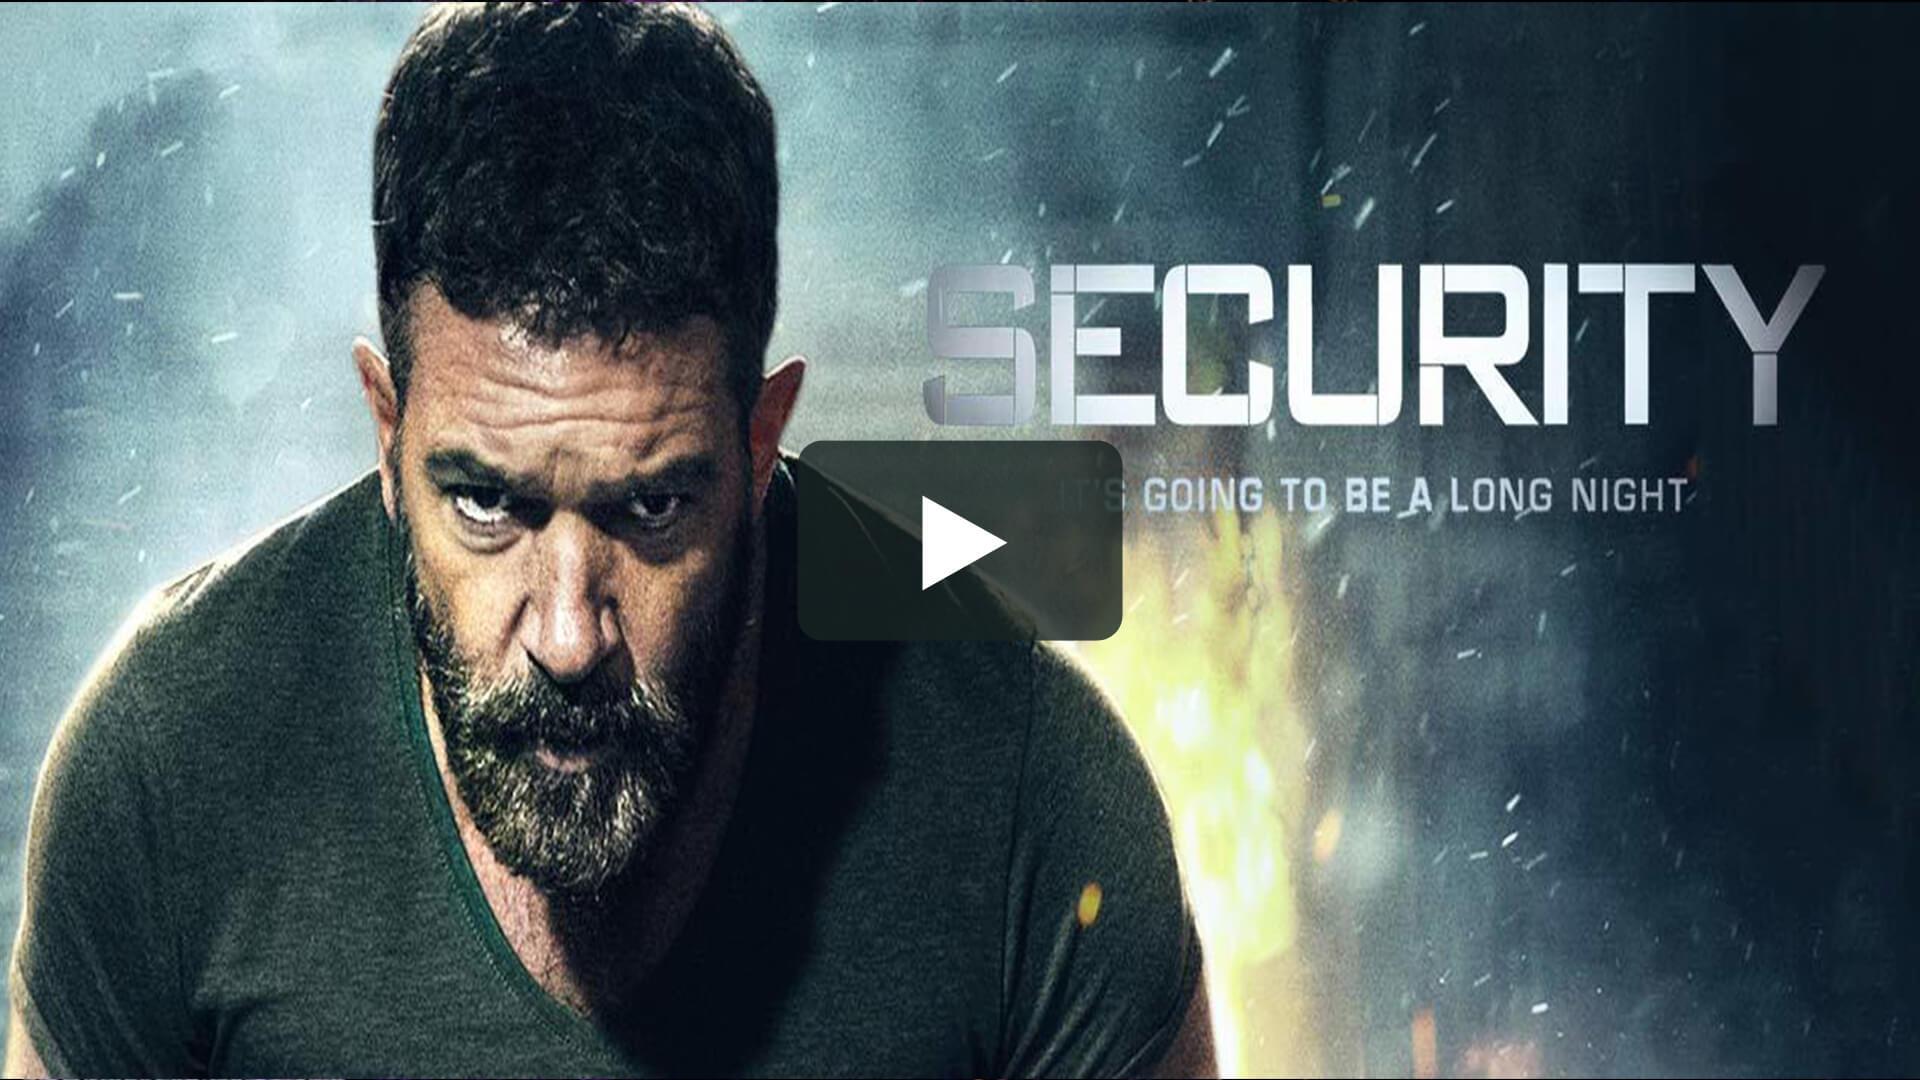 Security - 王牌保安